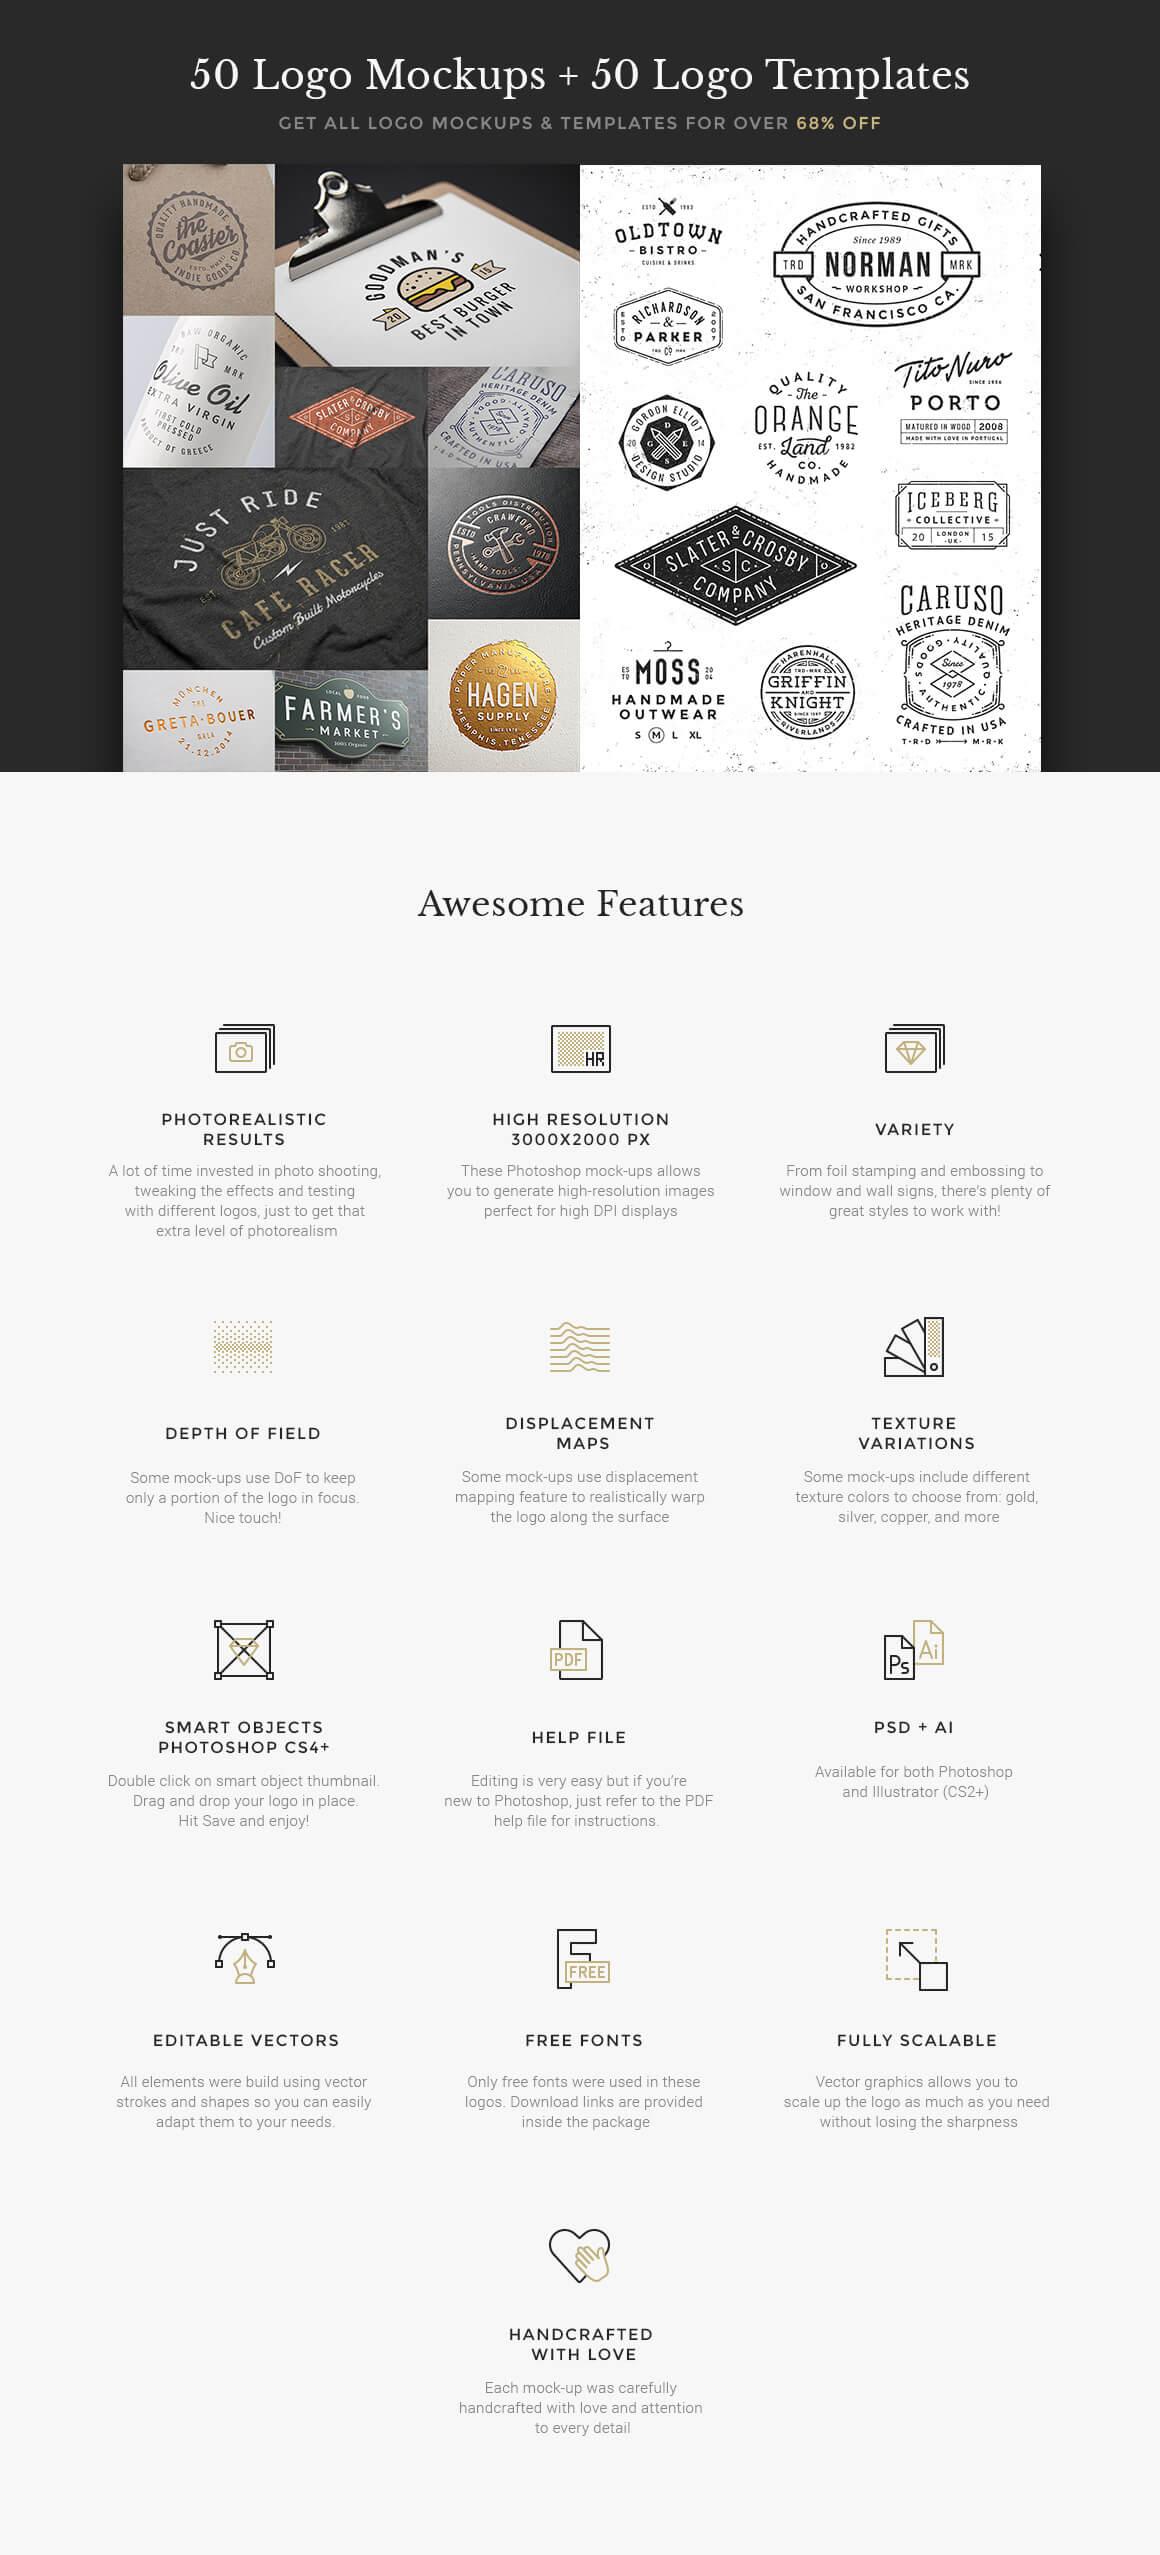 all-logo-mocks-templates-bundle-o